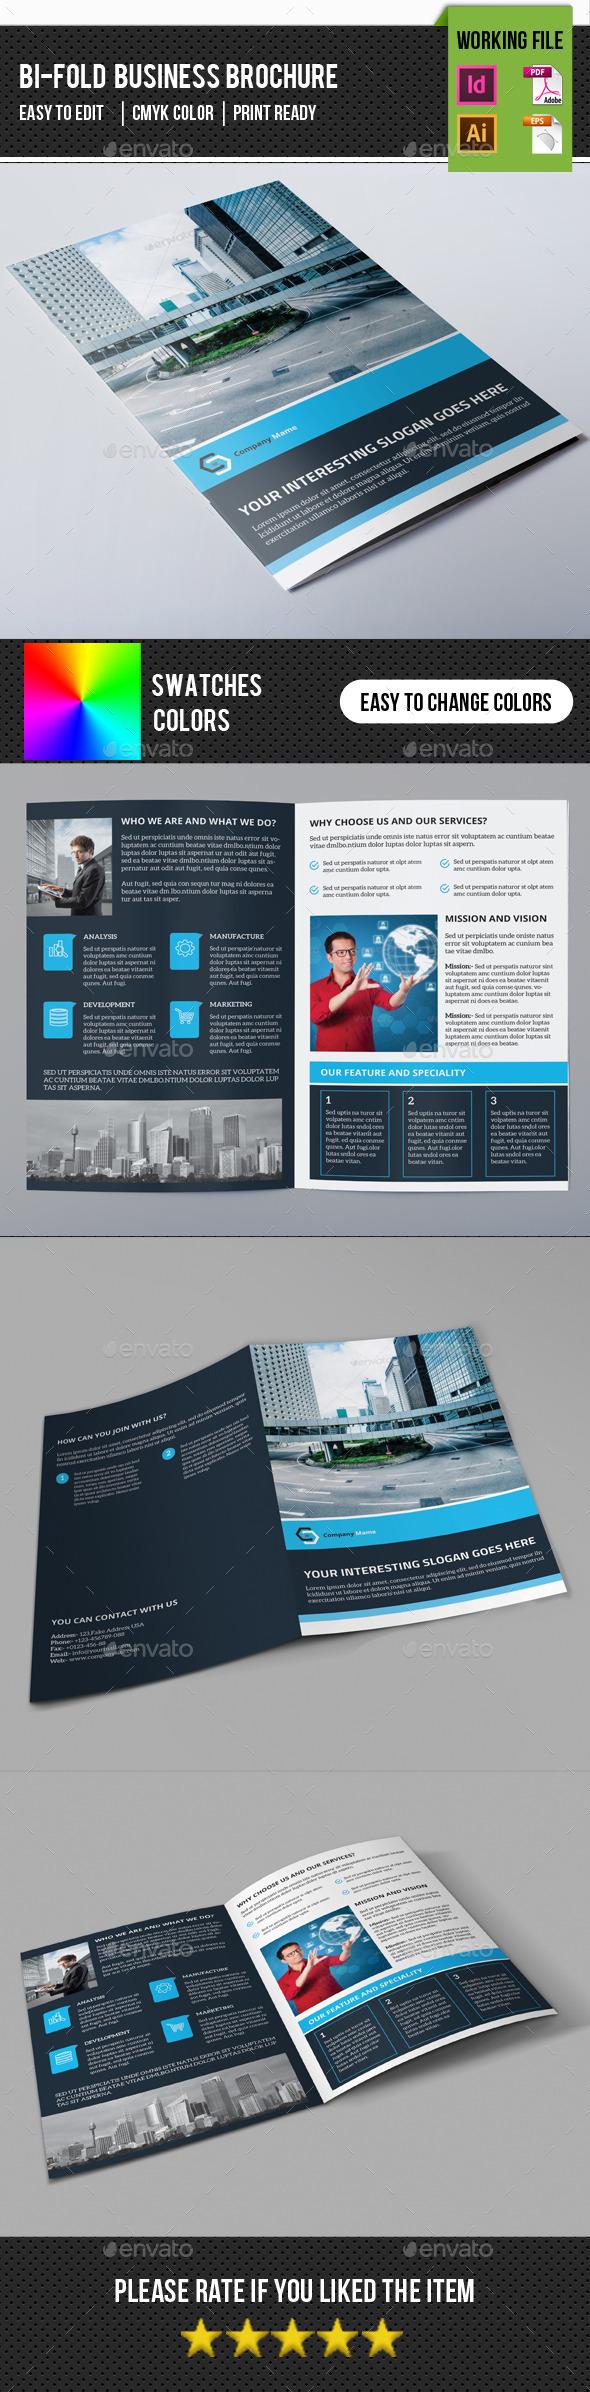 4 Page Corporate Brochure-295 - Corporate Brochures